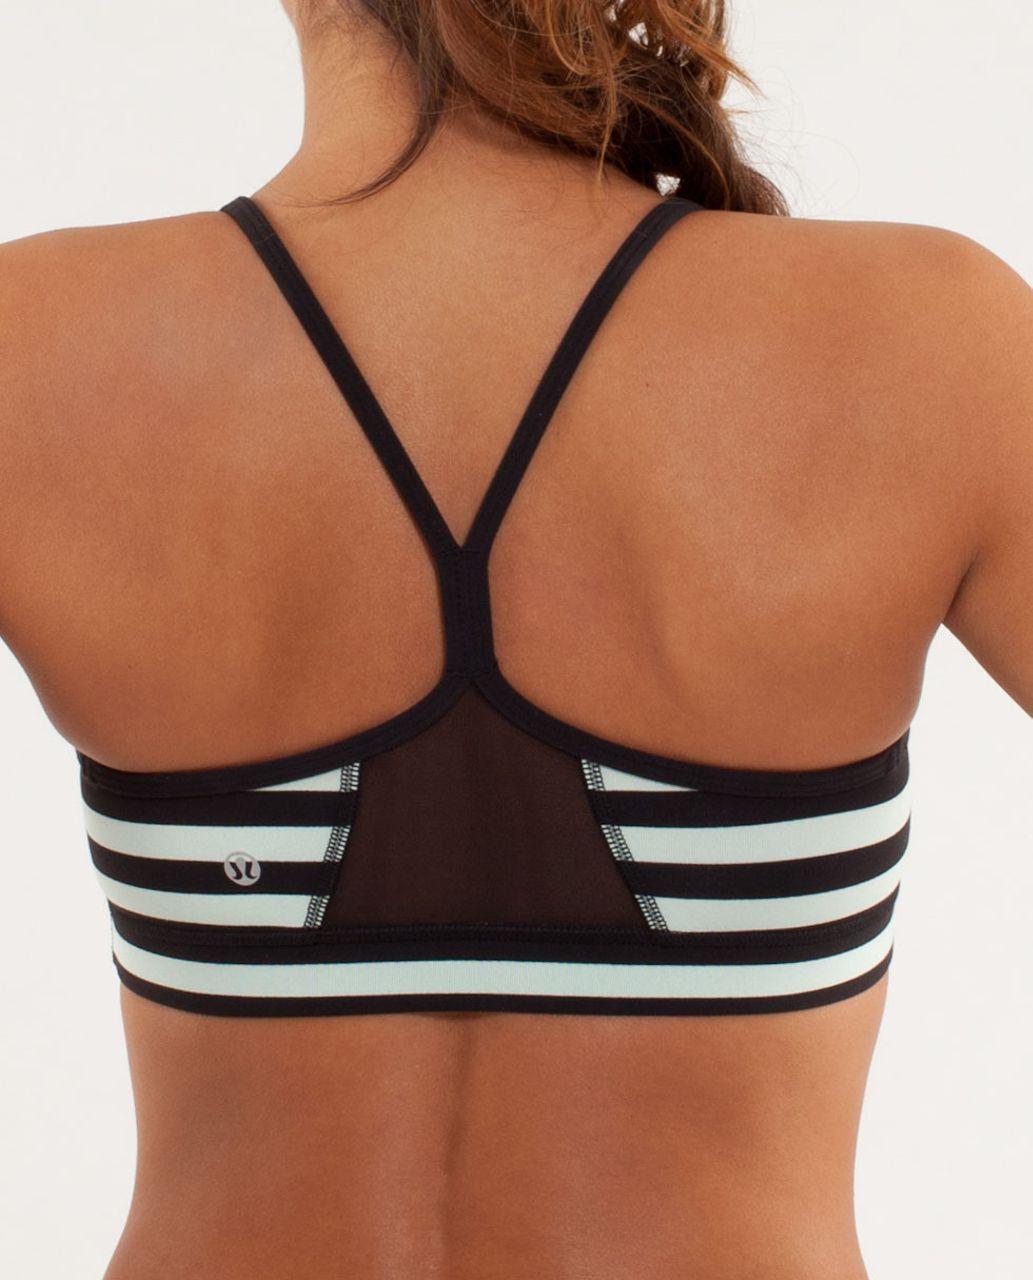 Lululemon Flow Y Bra IV - Sea Stripe Mint Moment Black / Black / Classic Stripe Mint Moment Black